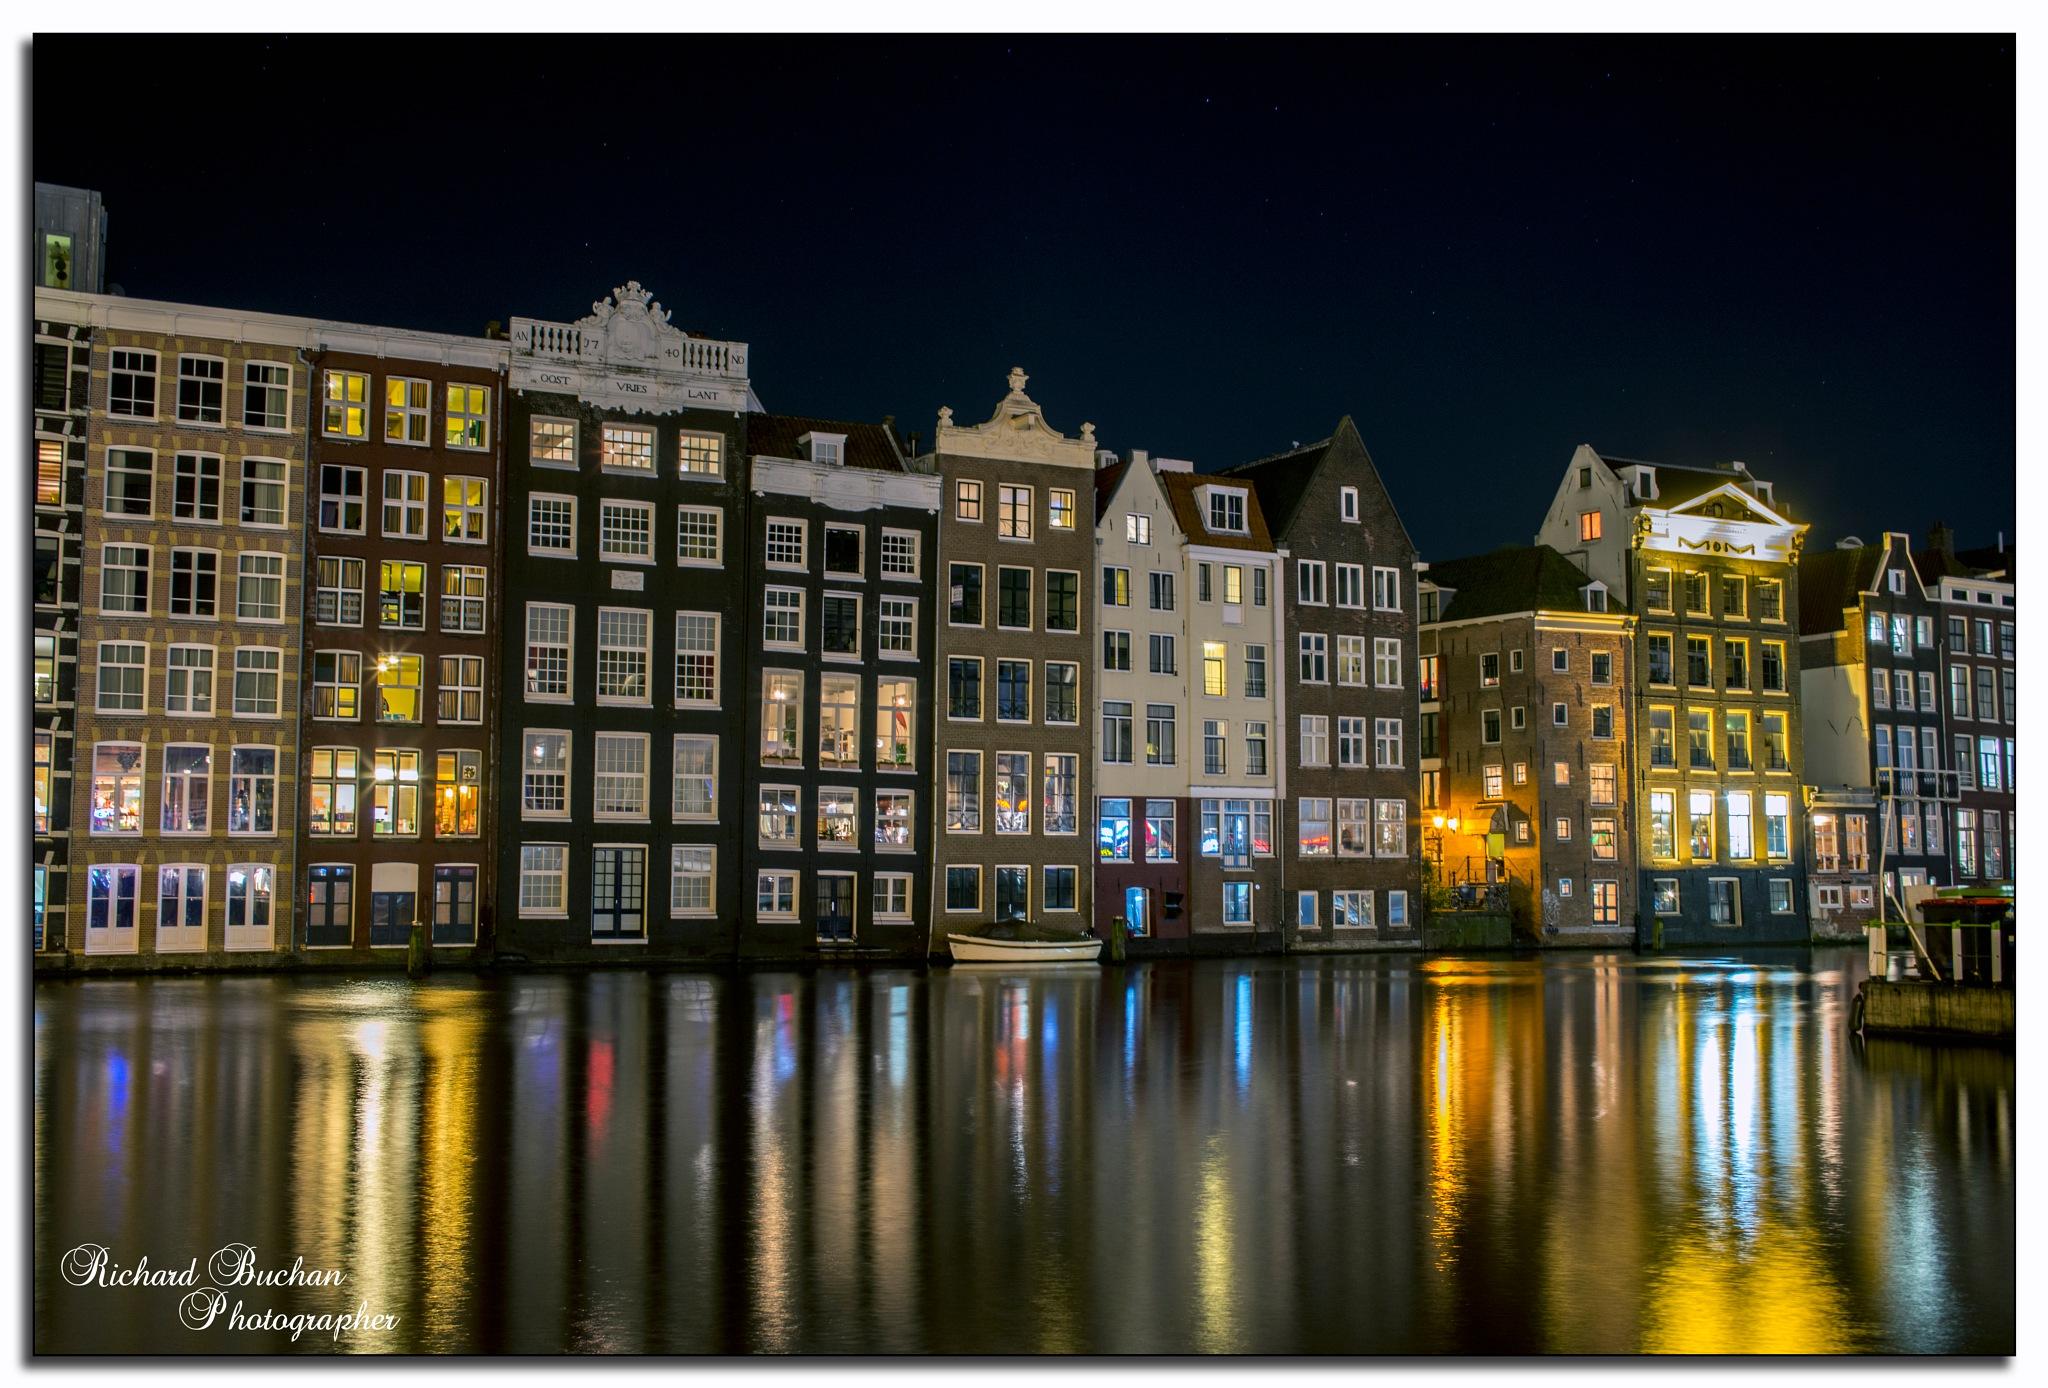 Amsterdam by Richardbuchan